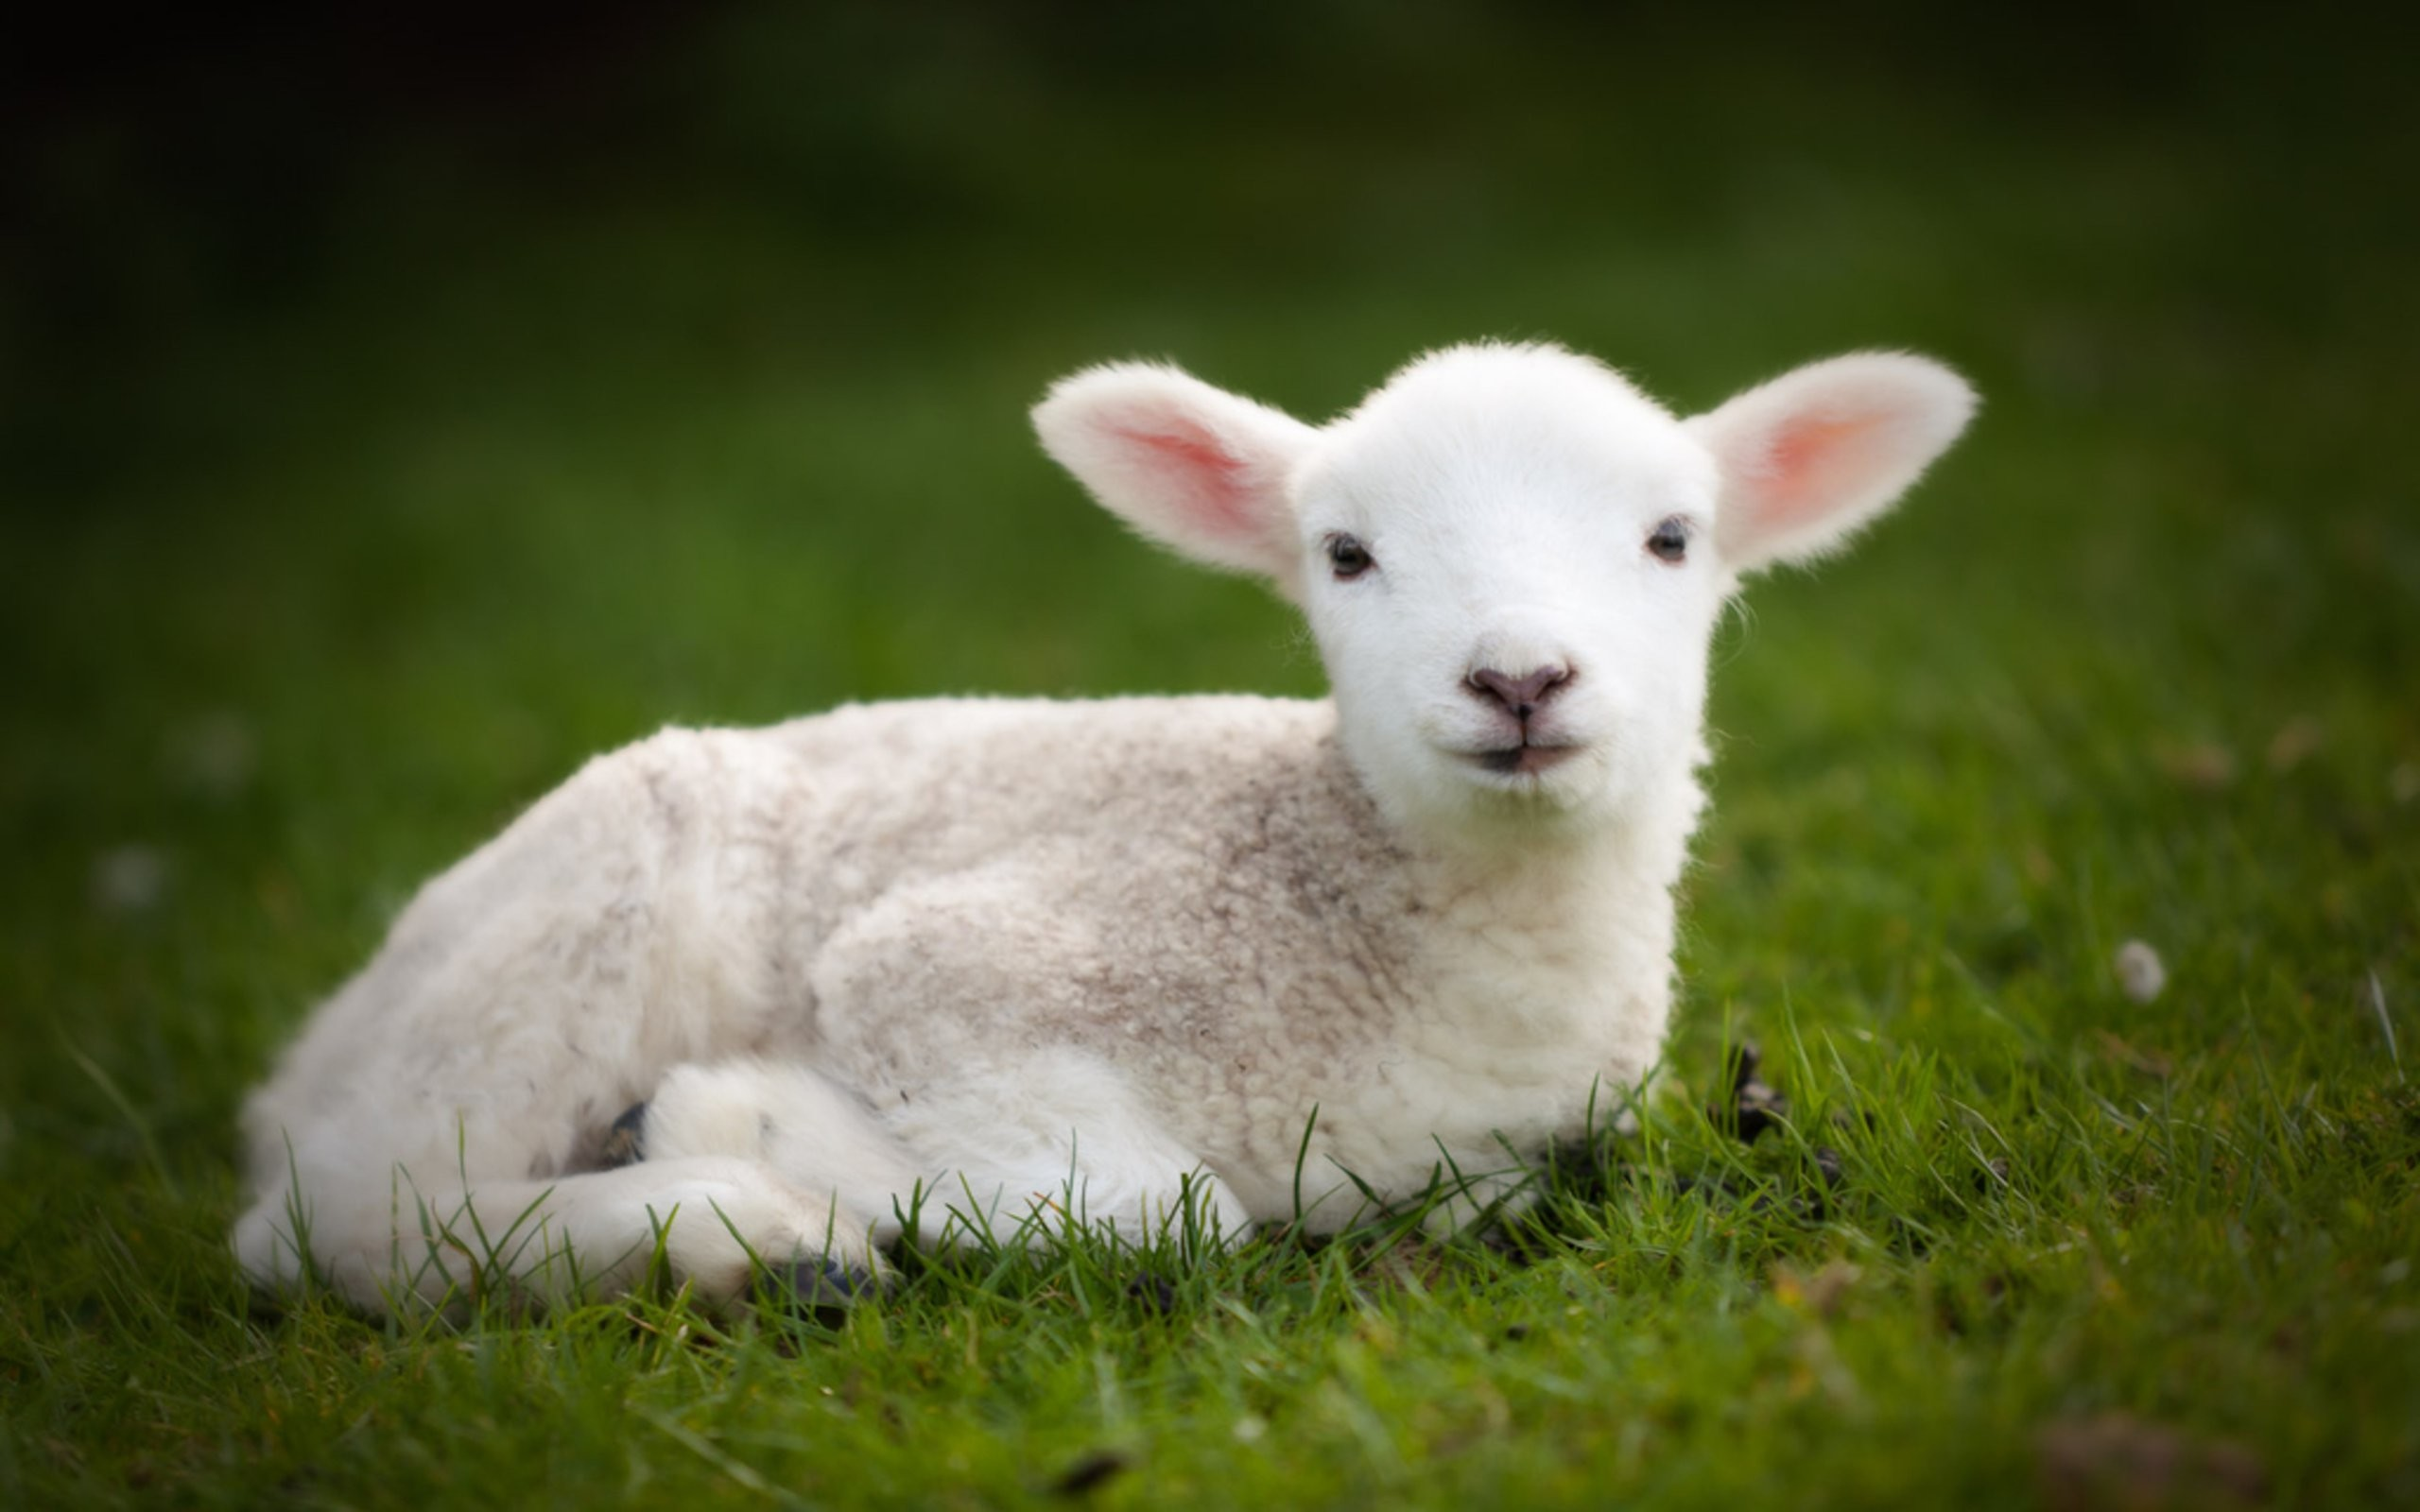 Cute Animal Wallpapers Free: Cute Baby Animal Wallpaper ·① WallpaperTag